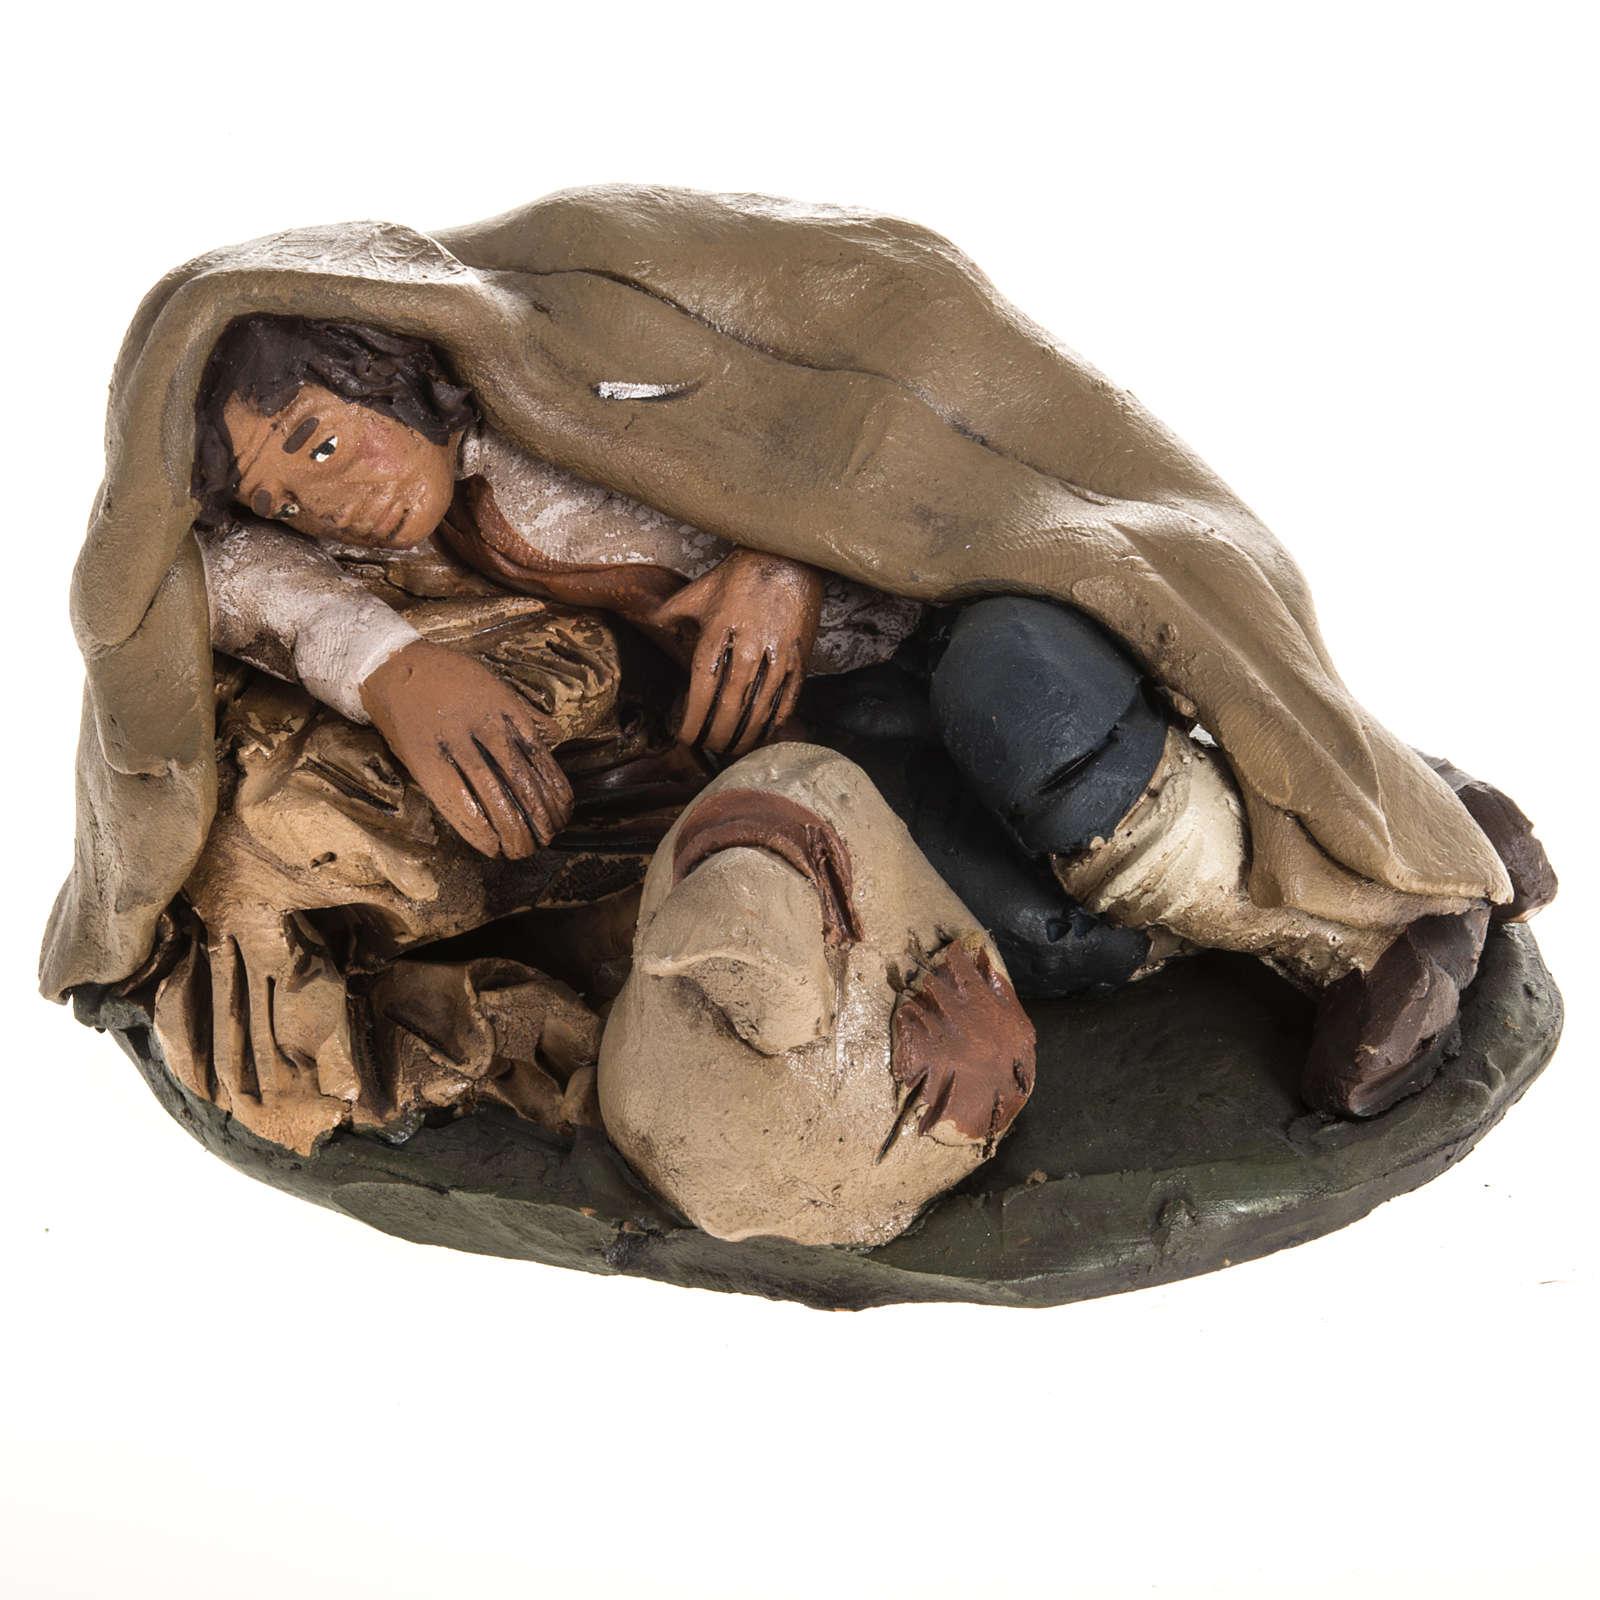 Dormiente terracotta presepe 18 cm 4